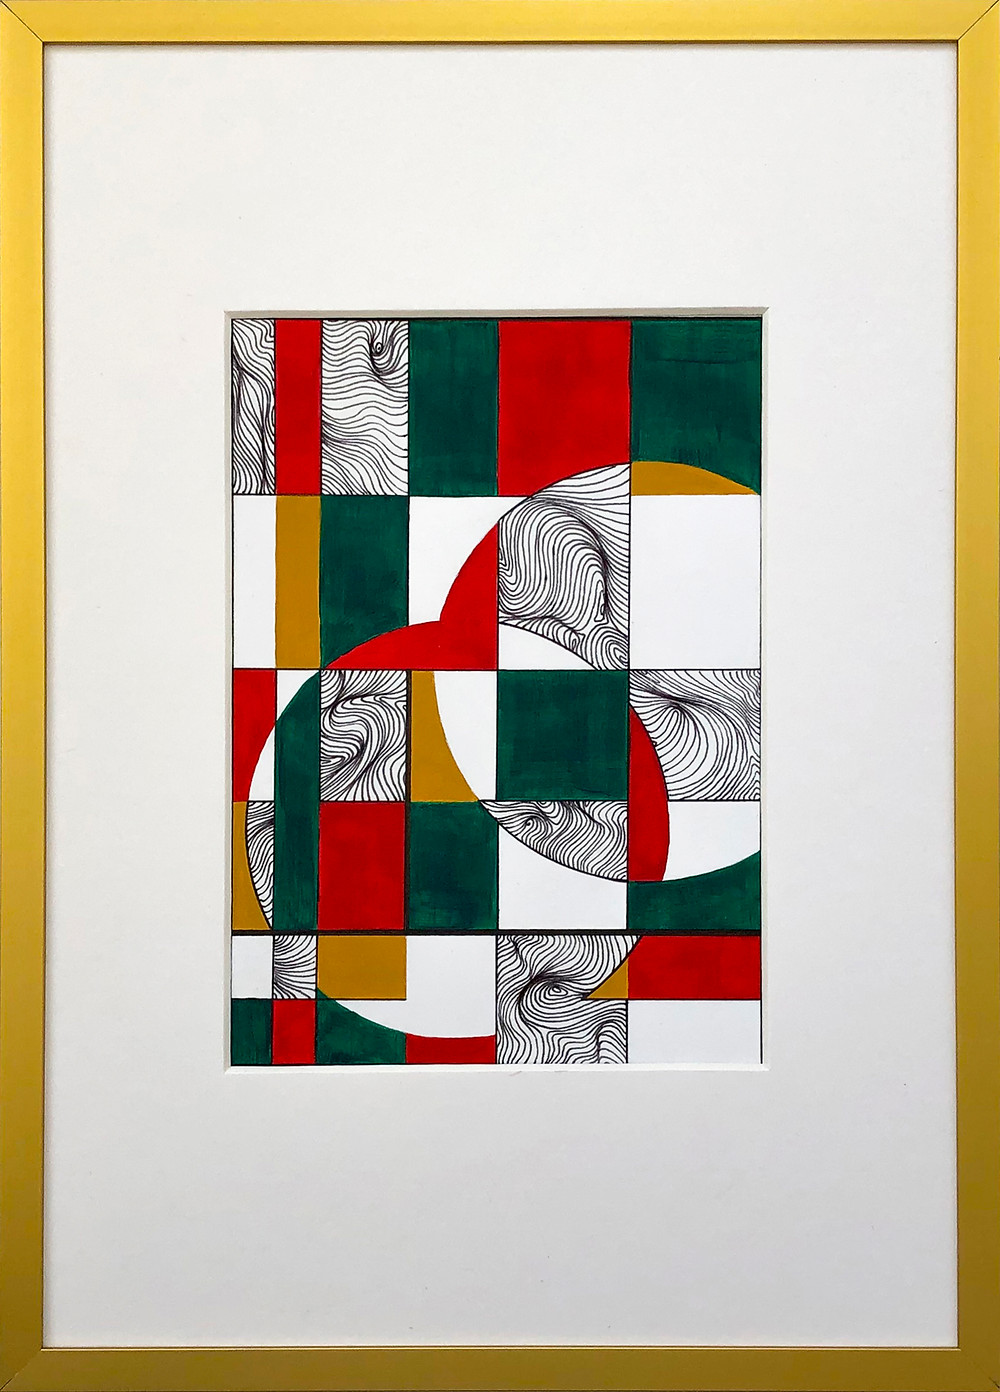 Art Herald Magazine, Gilbert Menassa, United Kingdom artist, UK artist, Line artist, Pen art